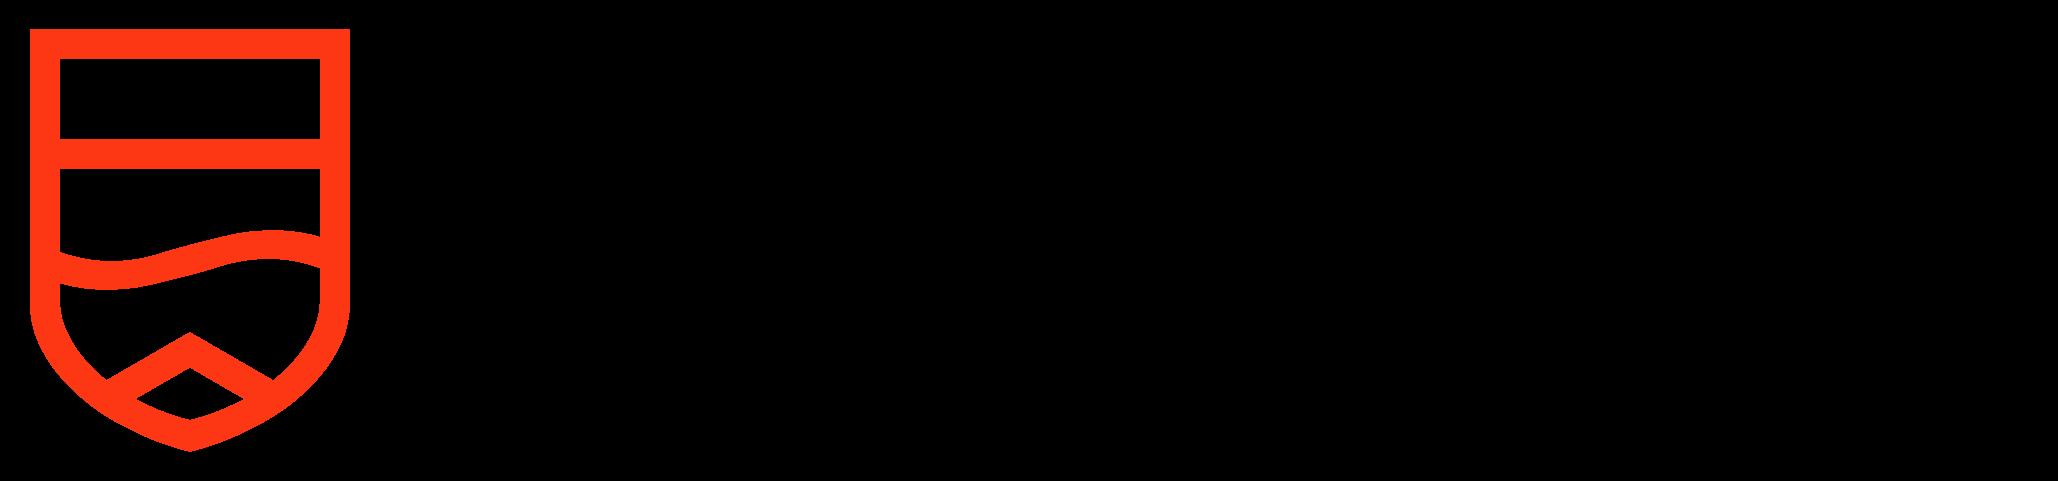 LandTrust logo